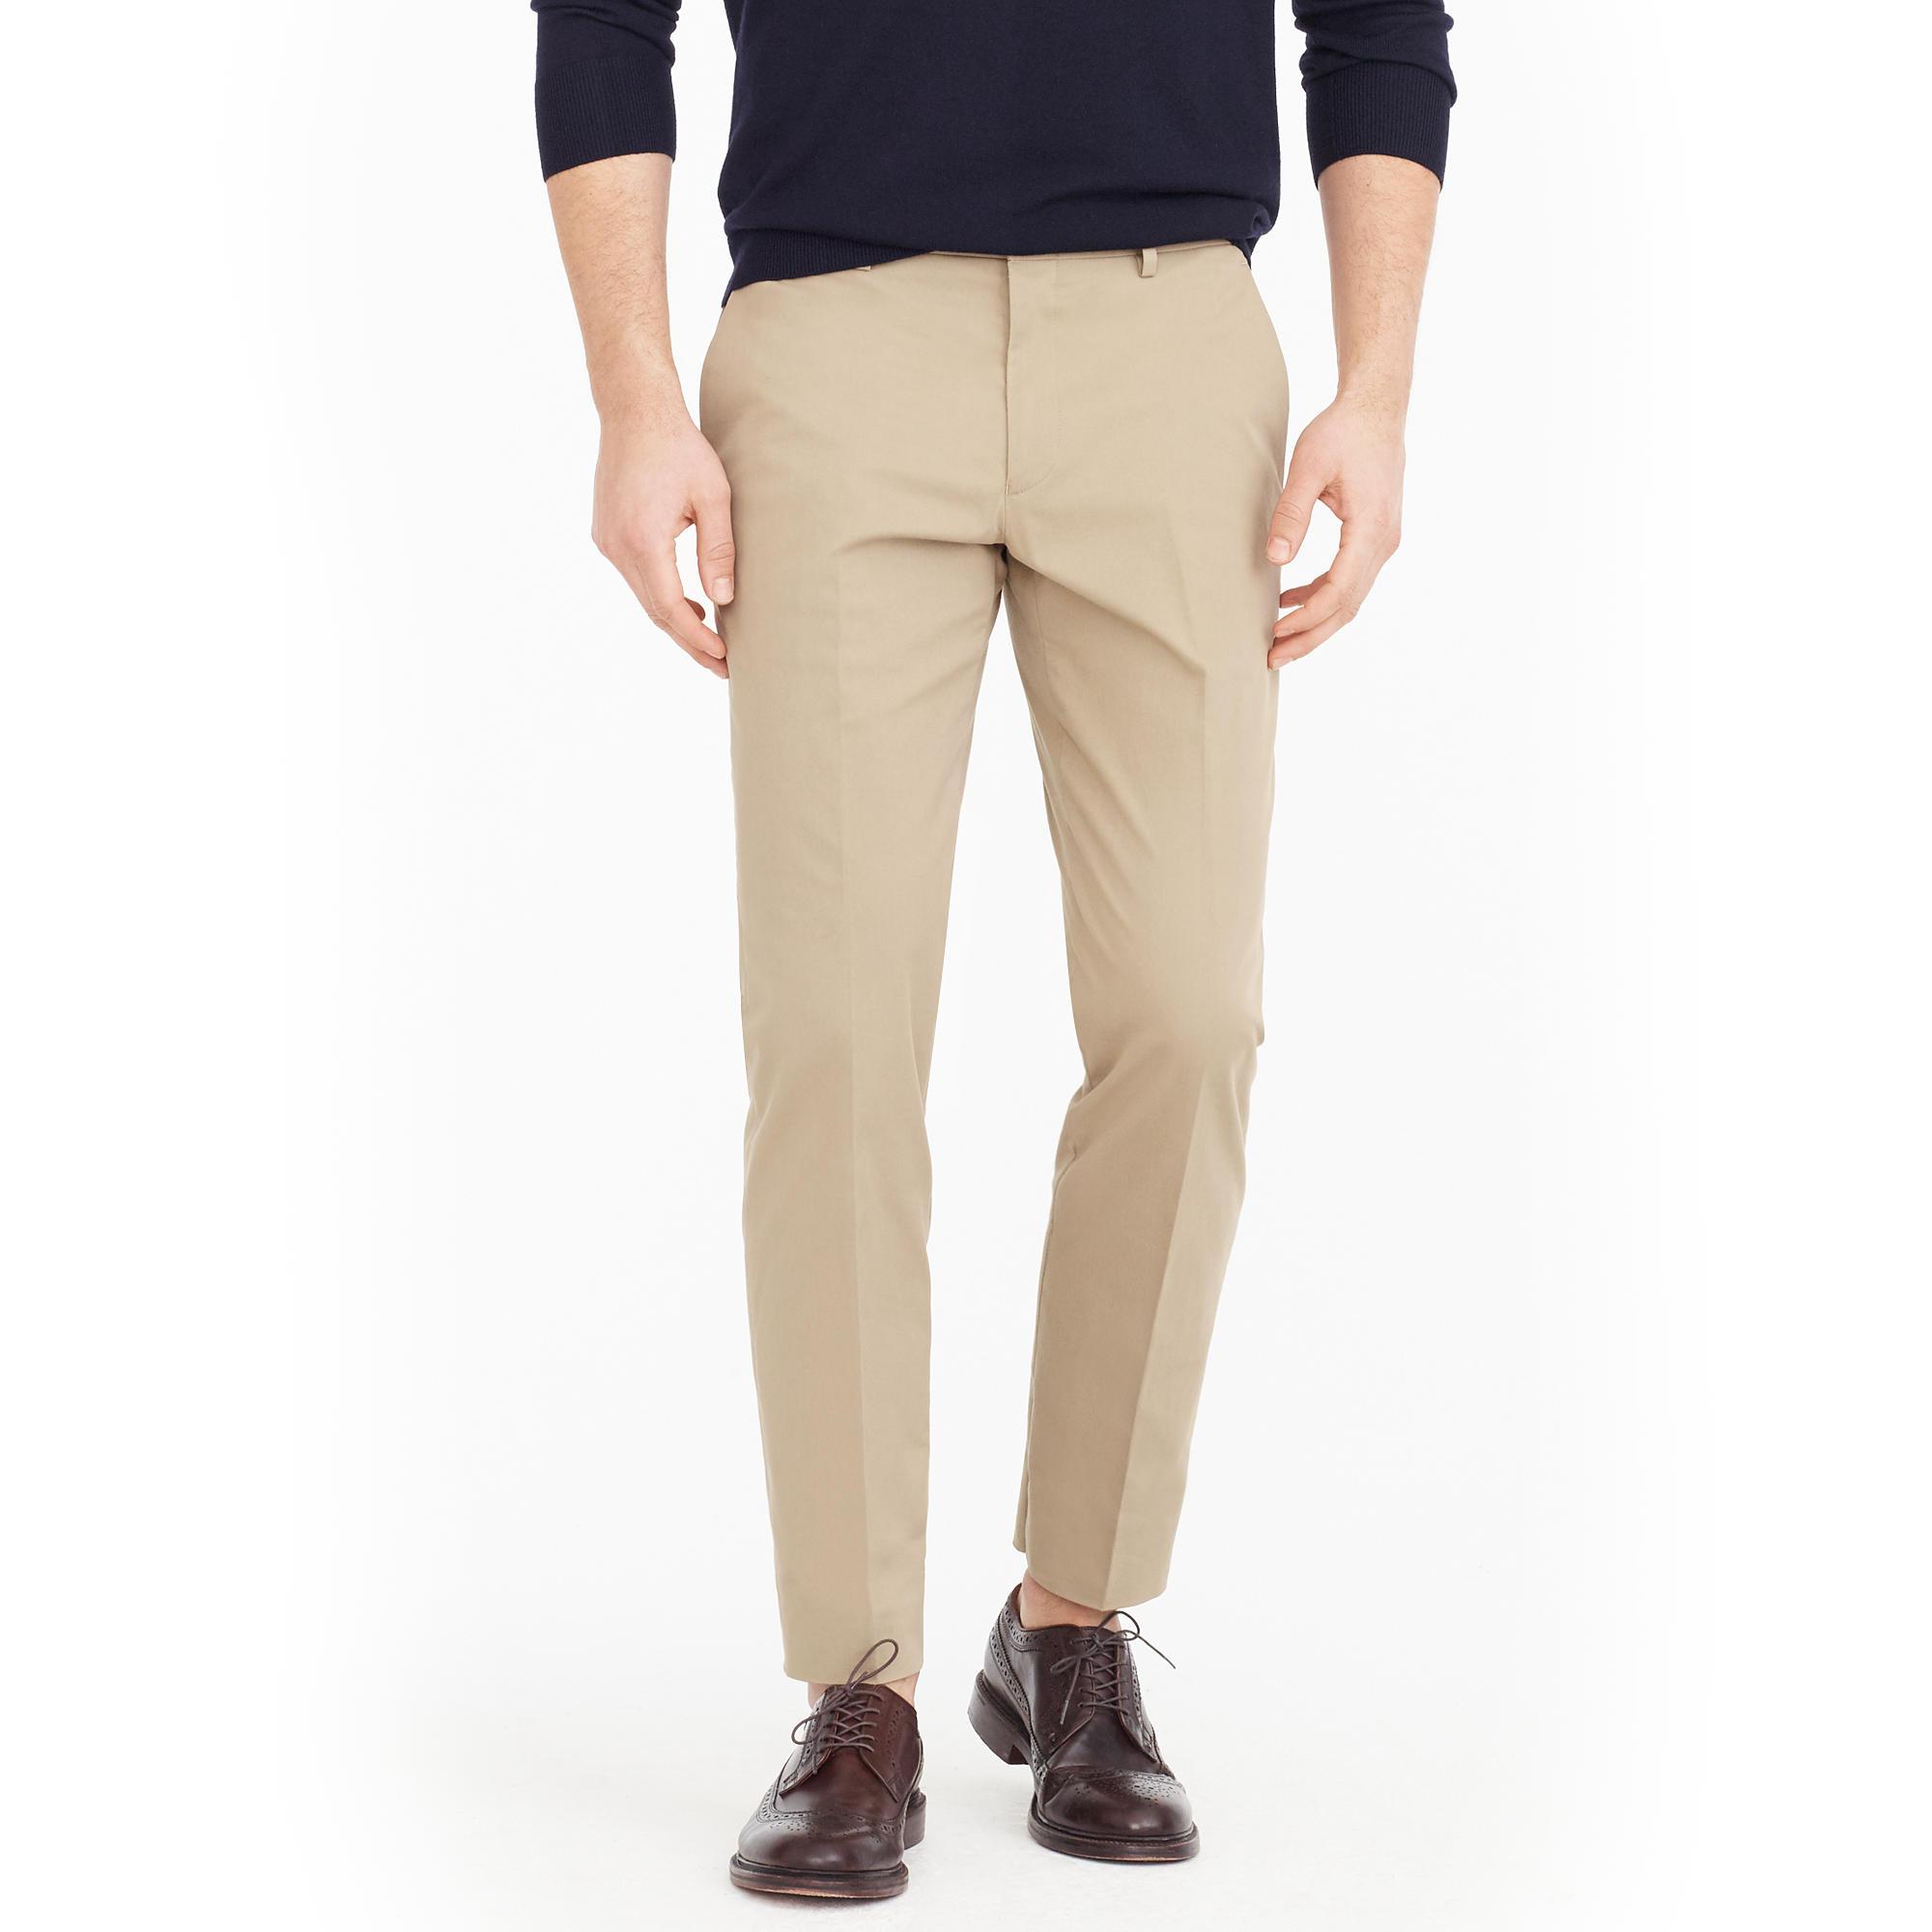 Men's Pants : Slim, Straight, Wallace & Barnes | J.Crew